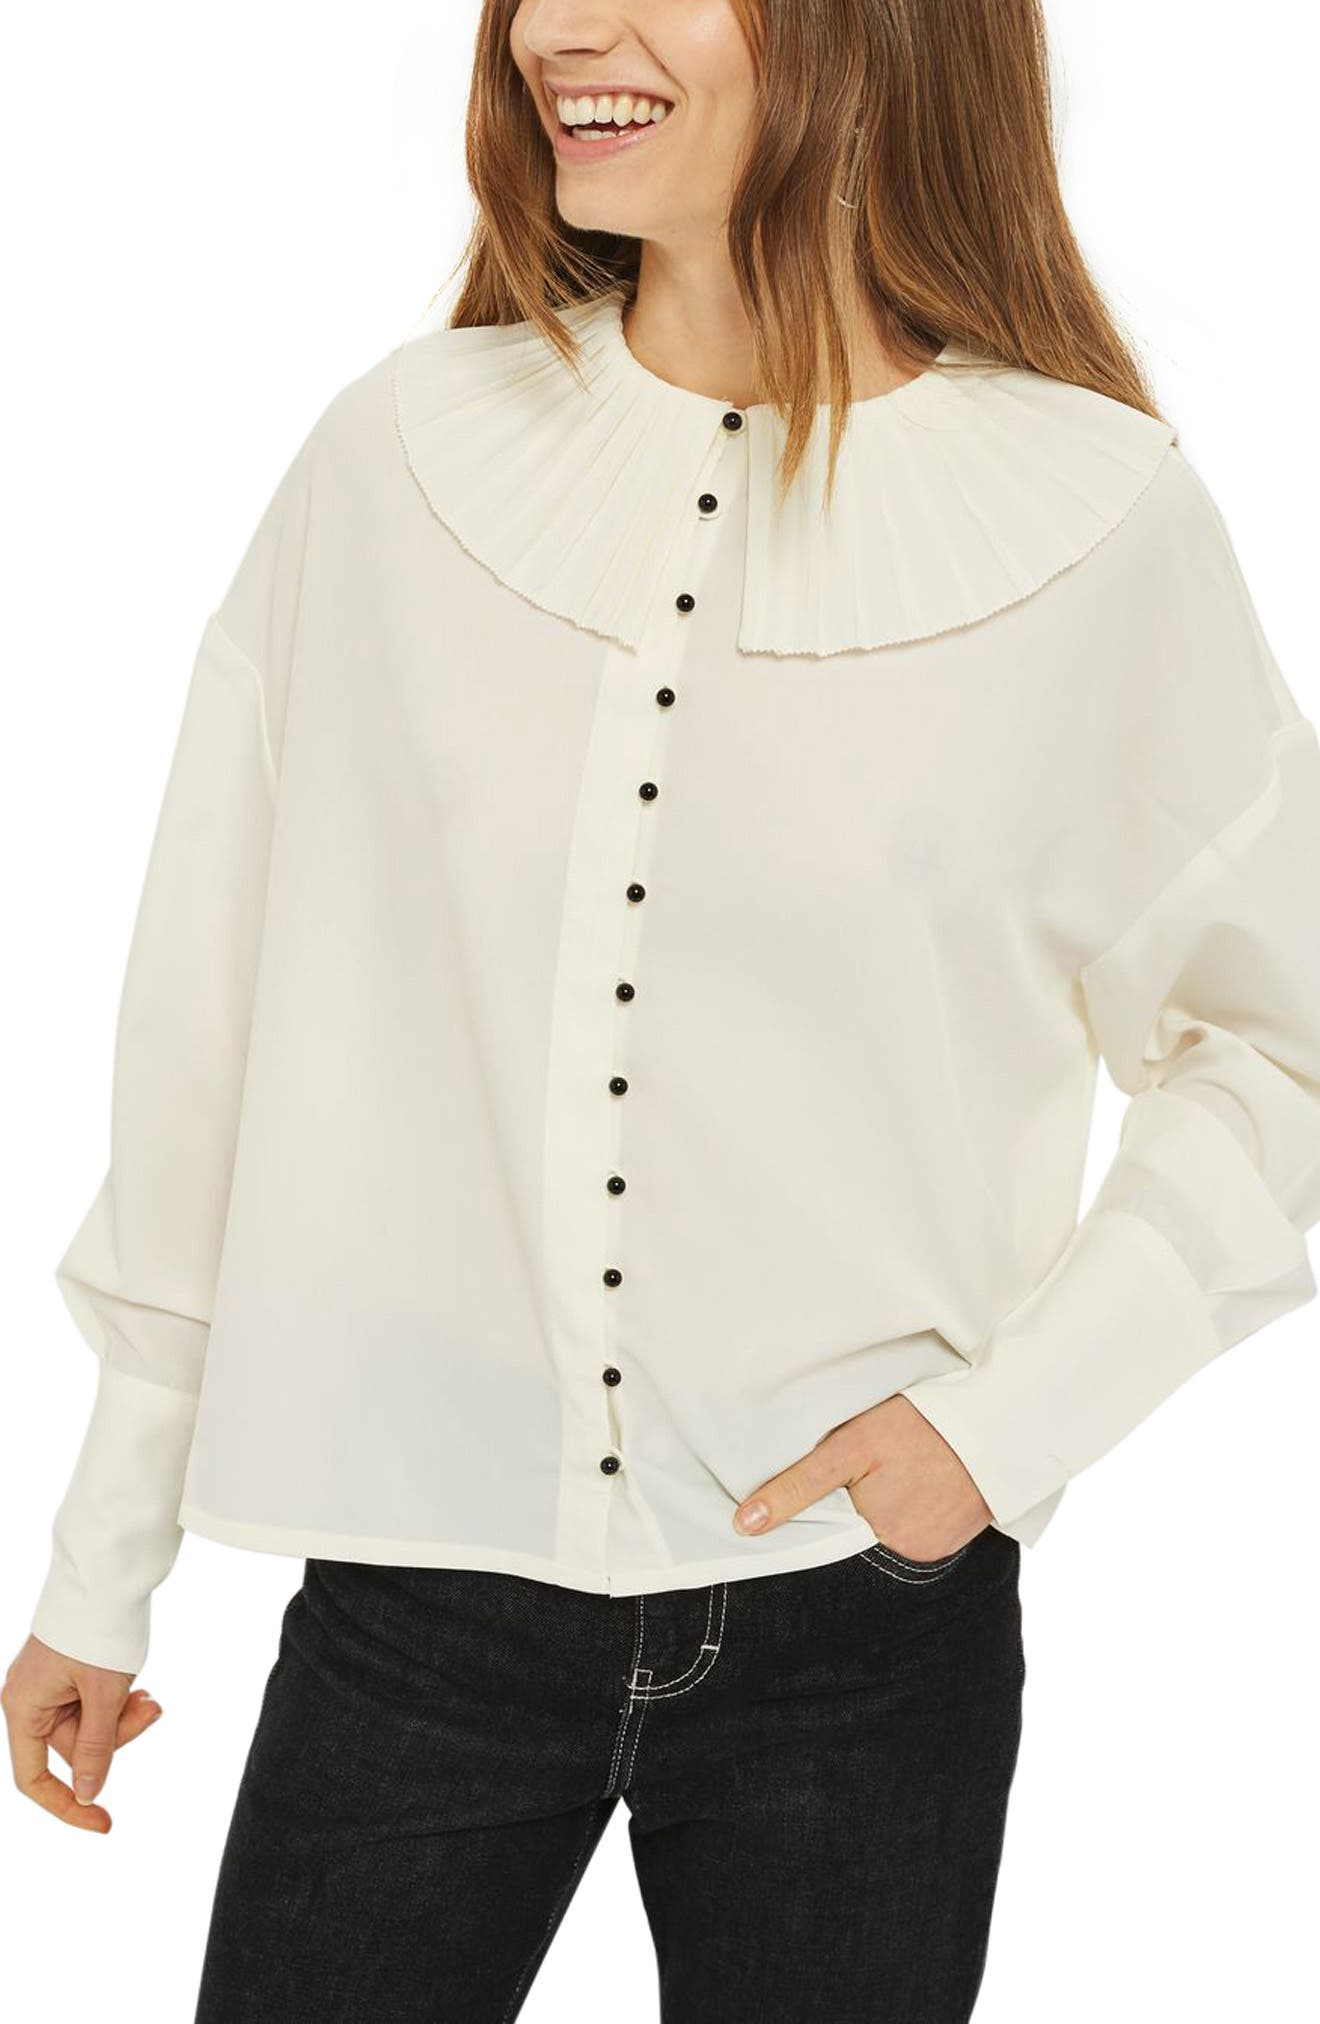 Pleated Collar Shirt,                             Main thumbnail 1, color,                             900